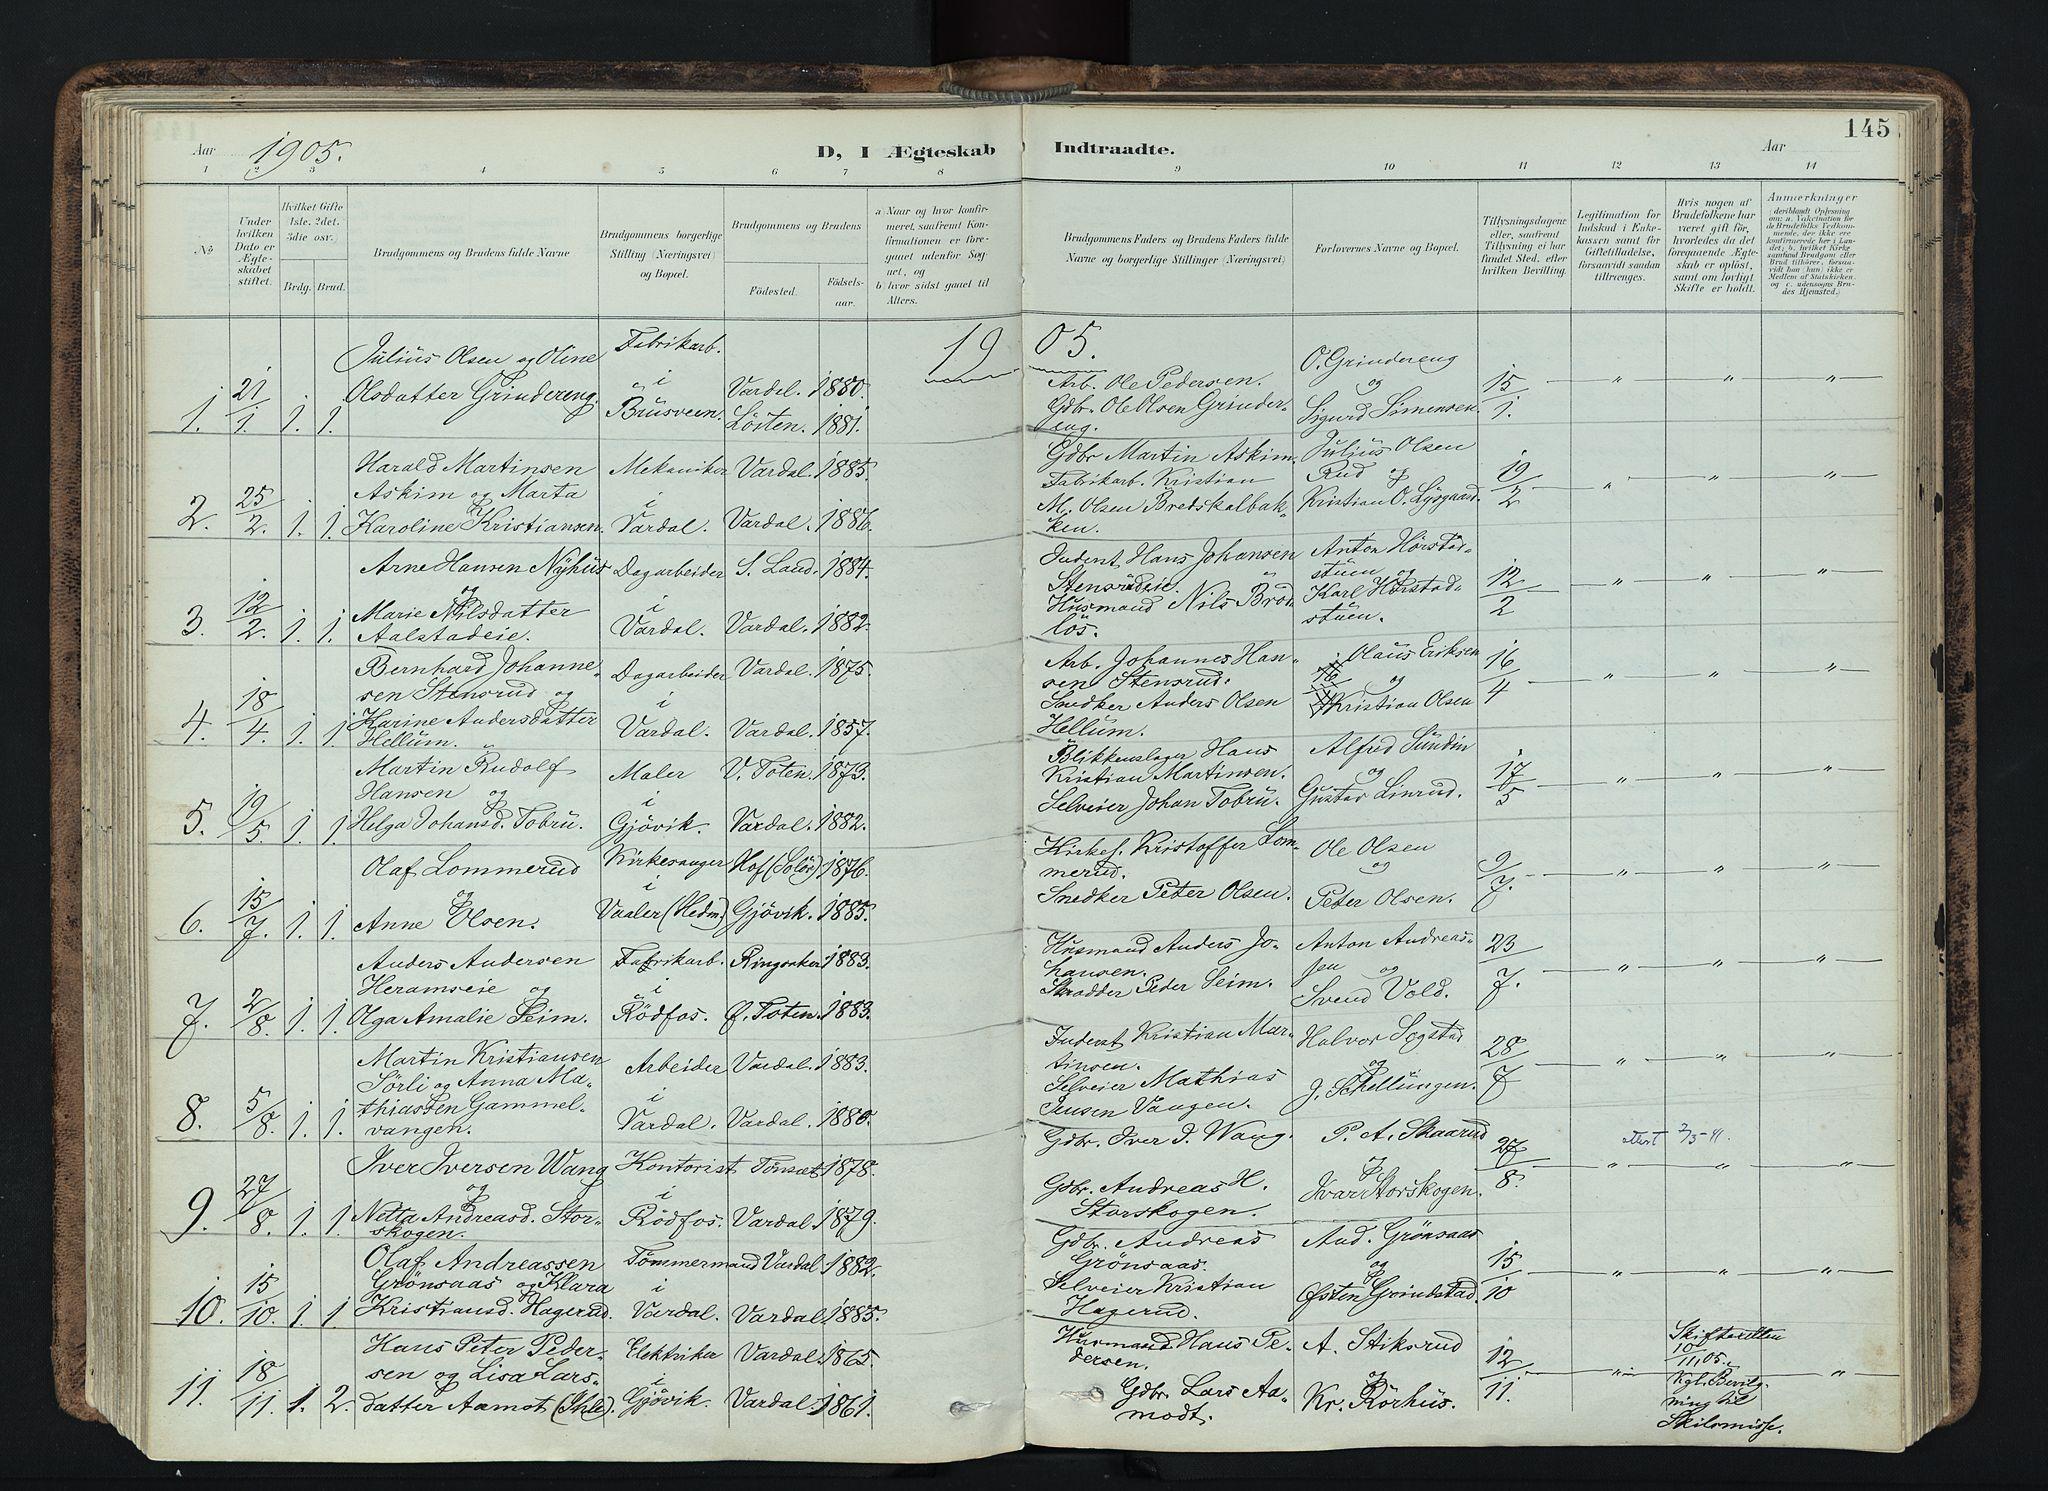 SAH, Vardal prestekontor, H/Ha/Haa/L0019: Ministerialbok nr. 19, 1893-1907, s. 145